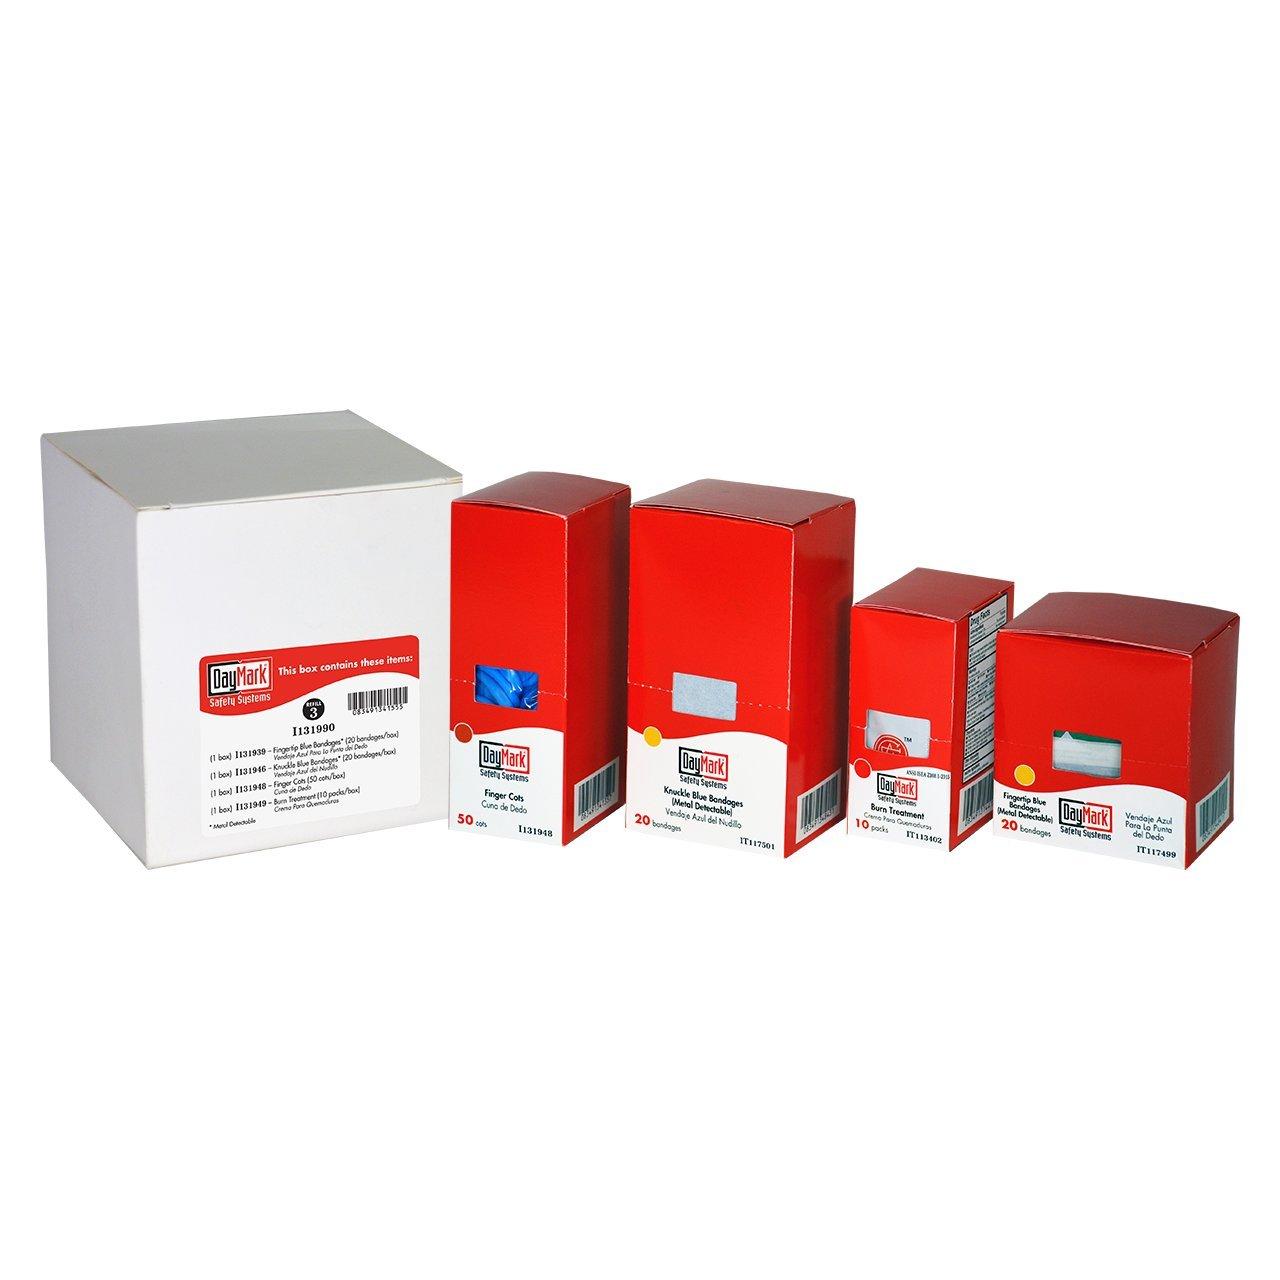 DayMark Standard First Aid Kit Refill Package 3, Fingertip Blue Vinyl Bandages, Knuckle Blue Vinyl Bandages, Finger Cots and First Aid/Burn Cream by DayMark Safety Systems